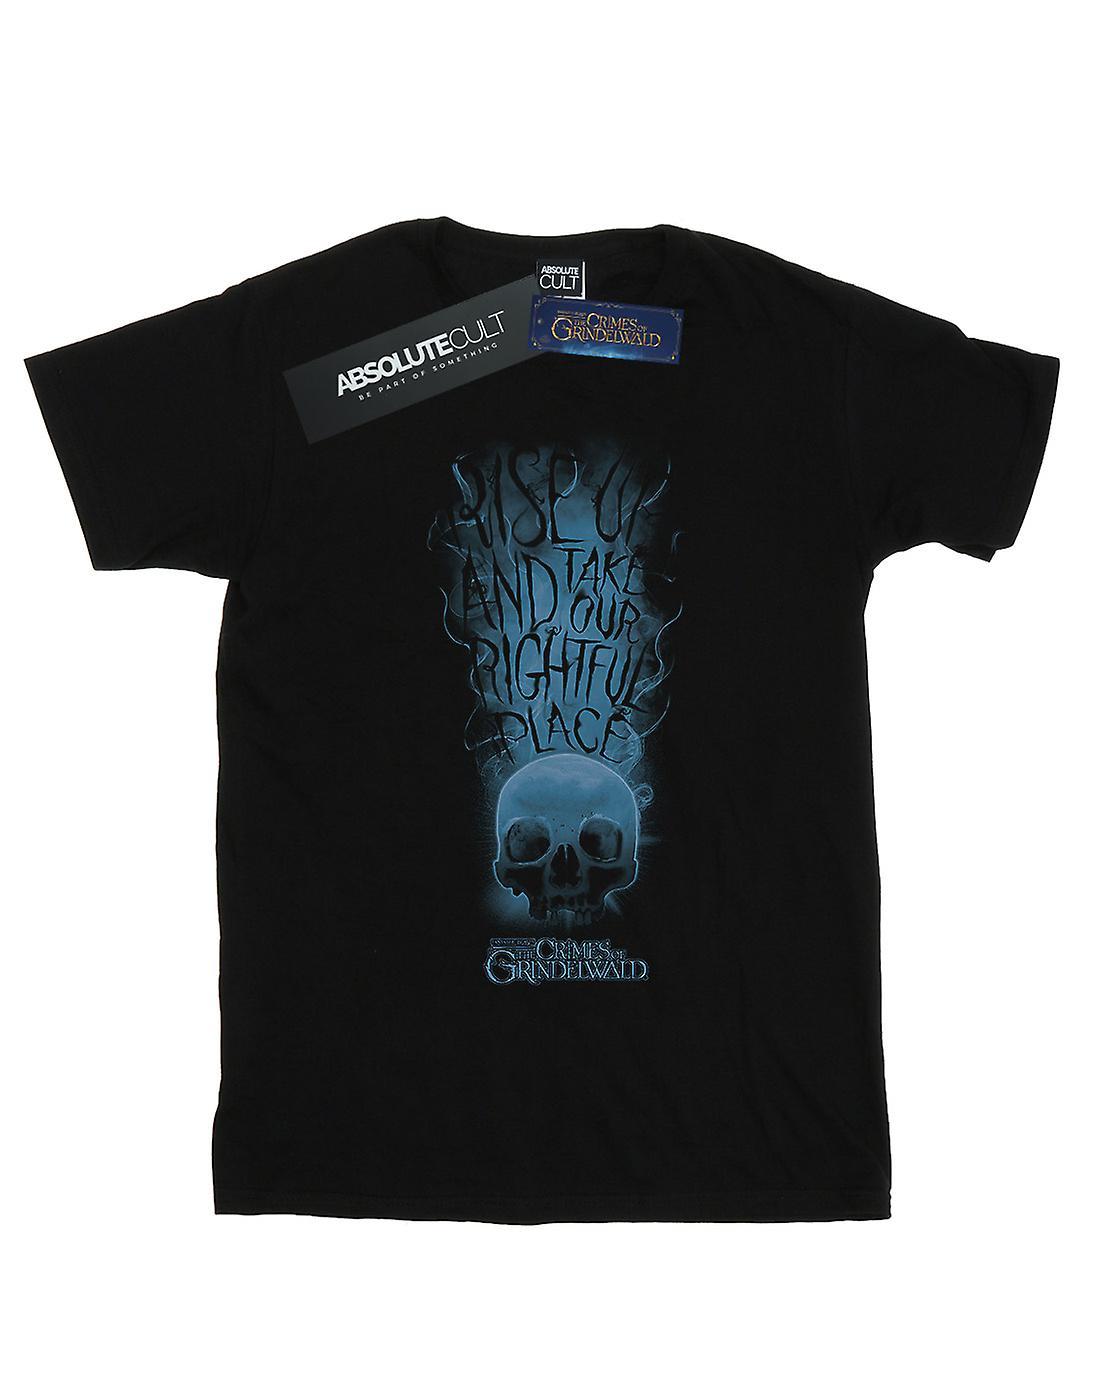 Fantastic Beasts Boys The Crimes Of Grindelwald Skull Smoke T-Shirt